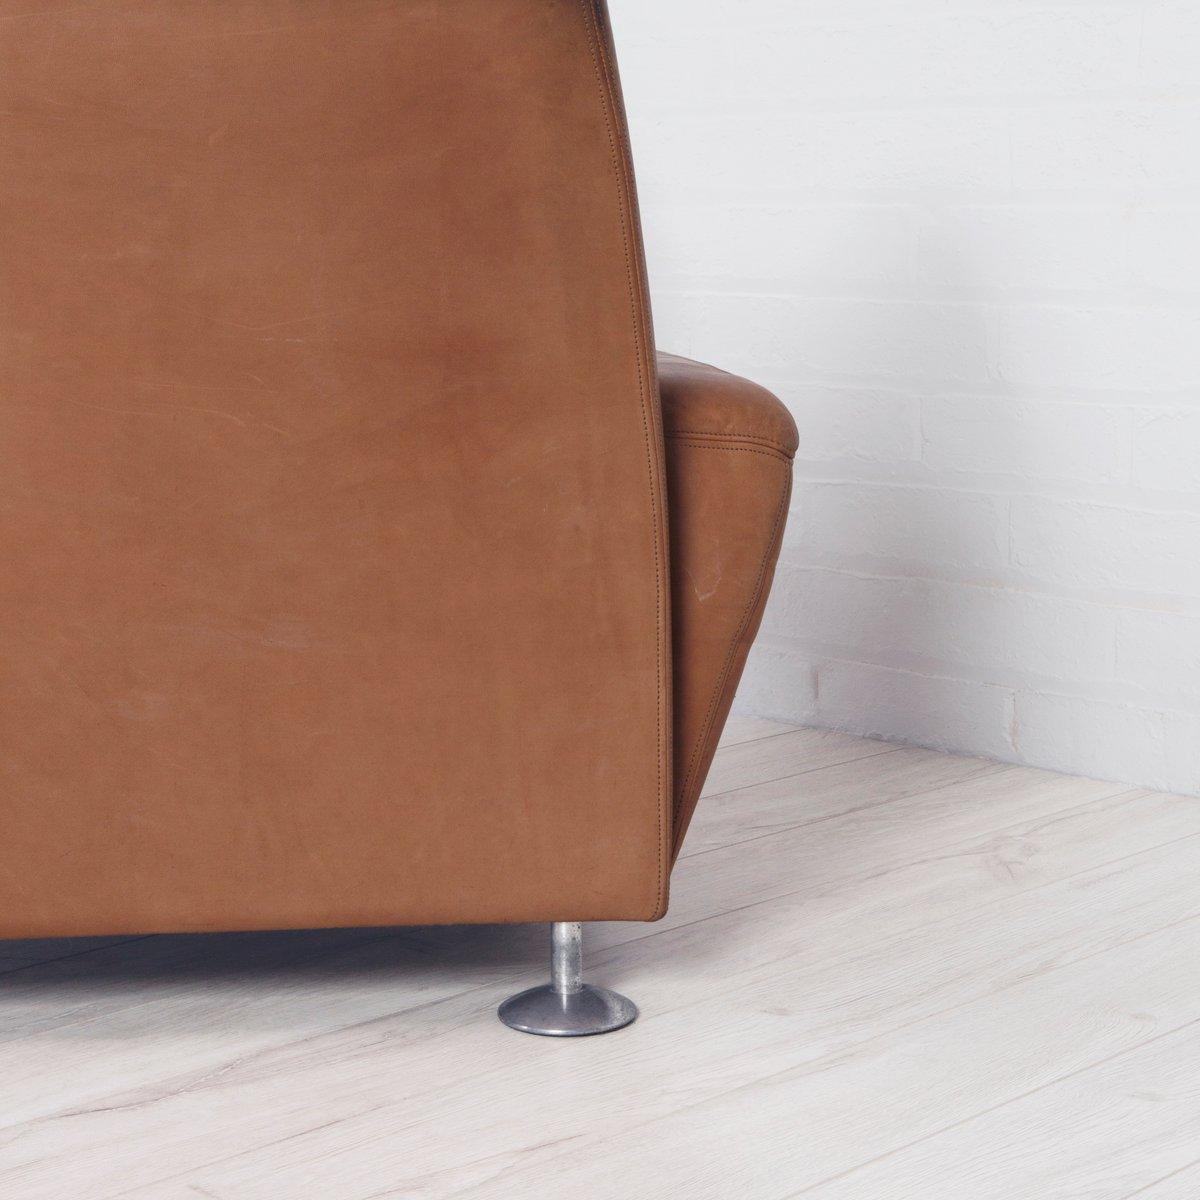 hellbrauner vintage ledersessel bei pamono kaufen. Black Bedroom Furniture Sets. Home Design Ideas